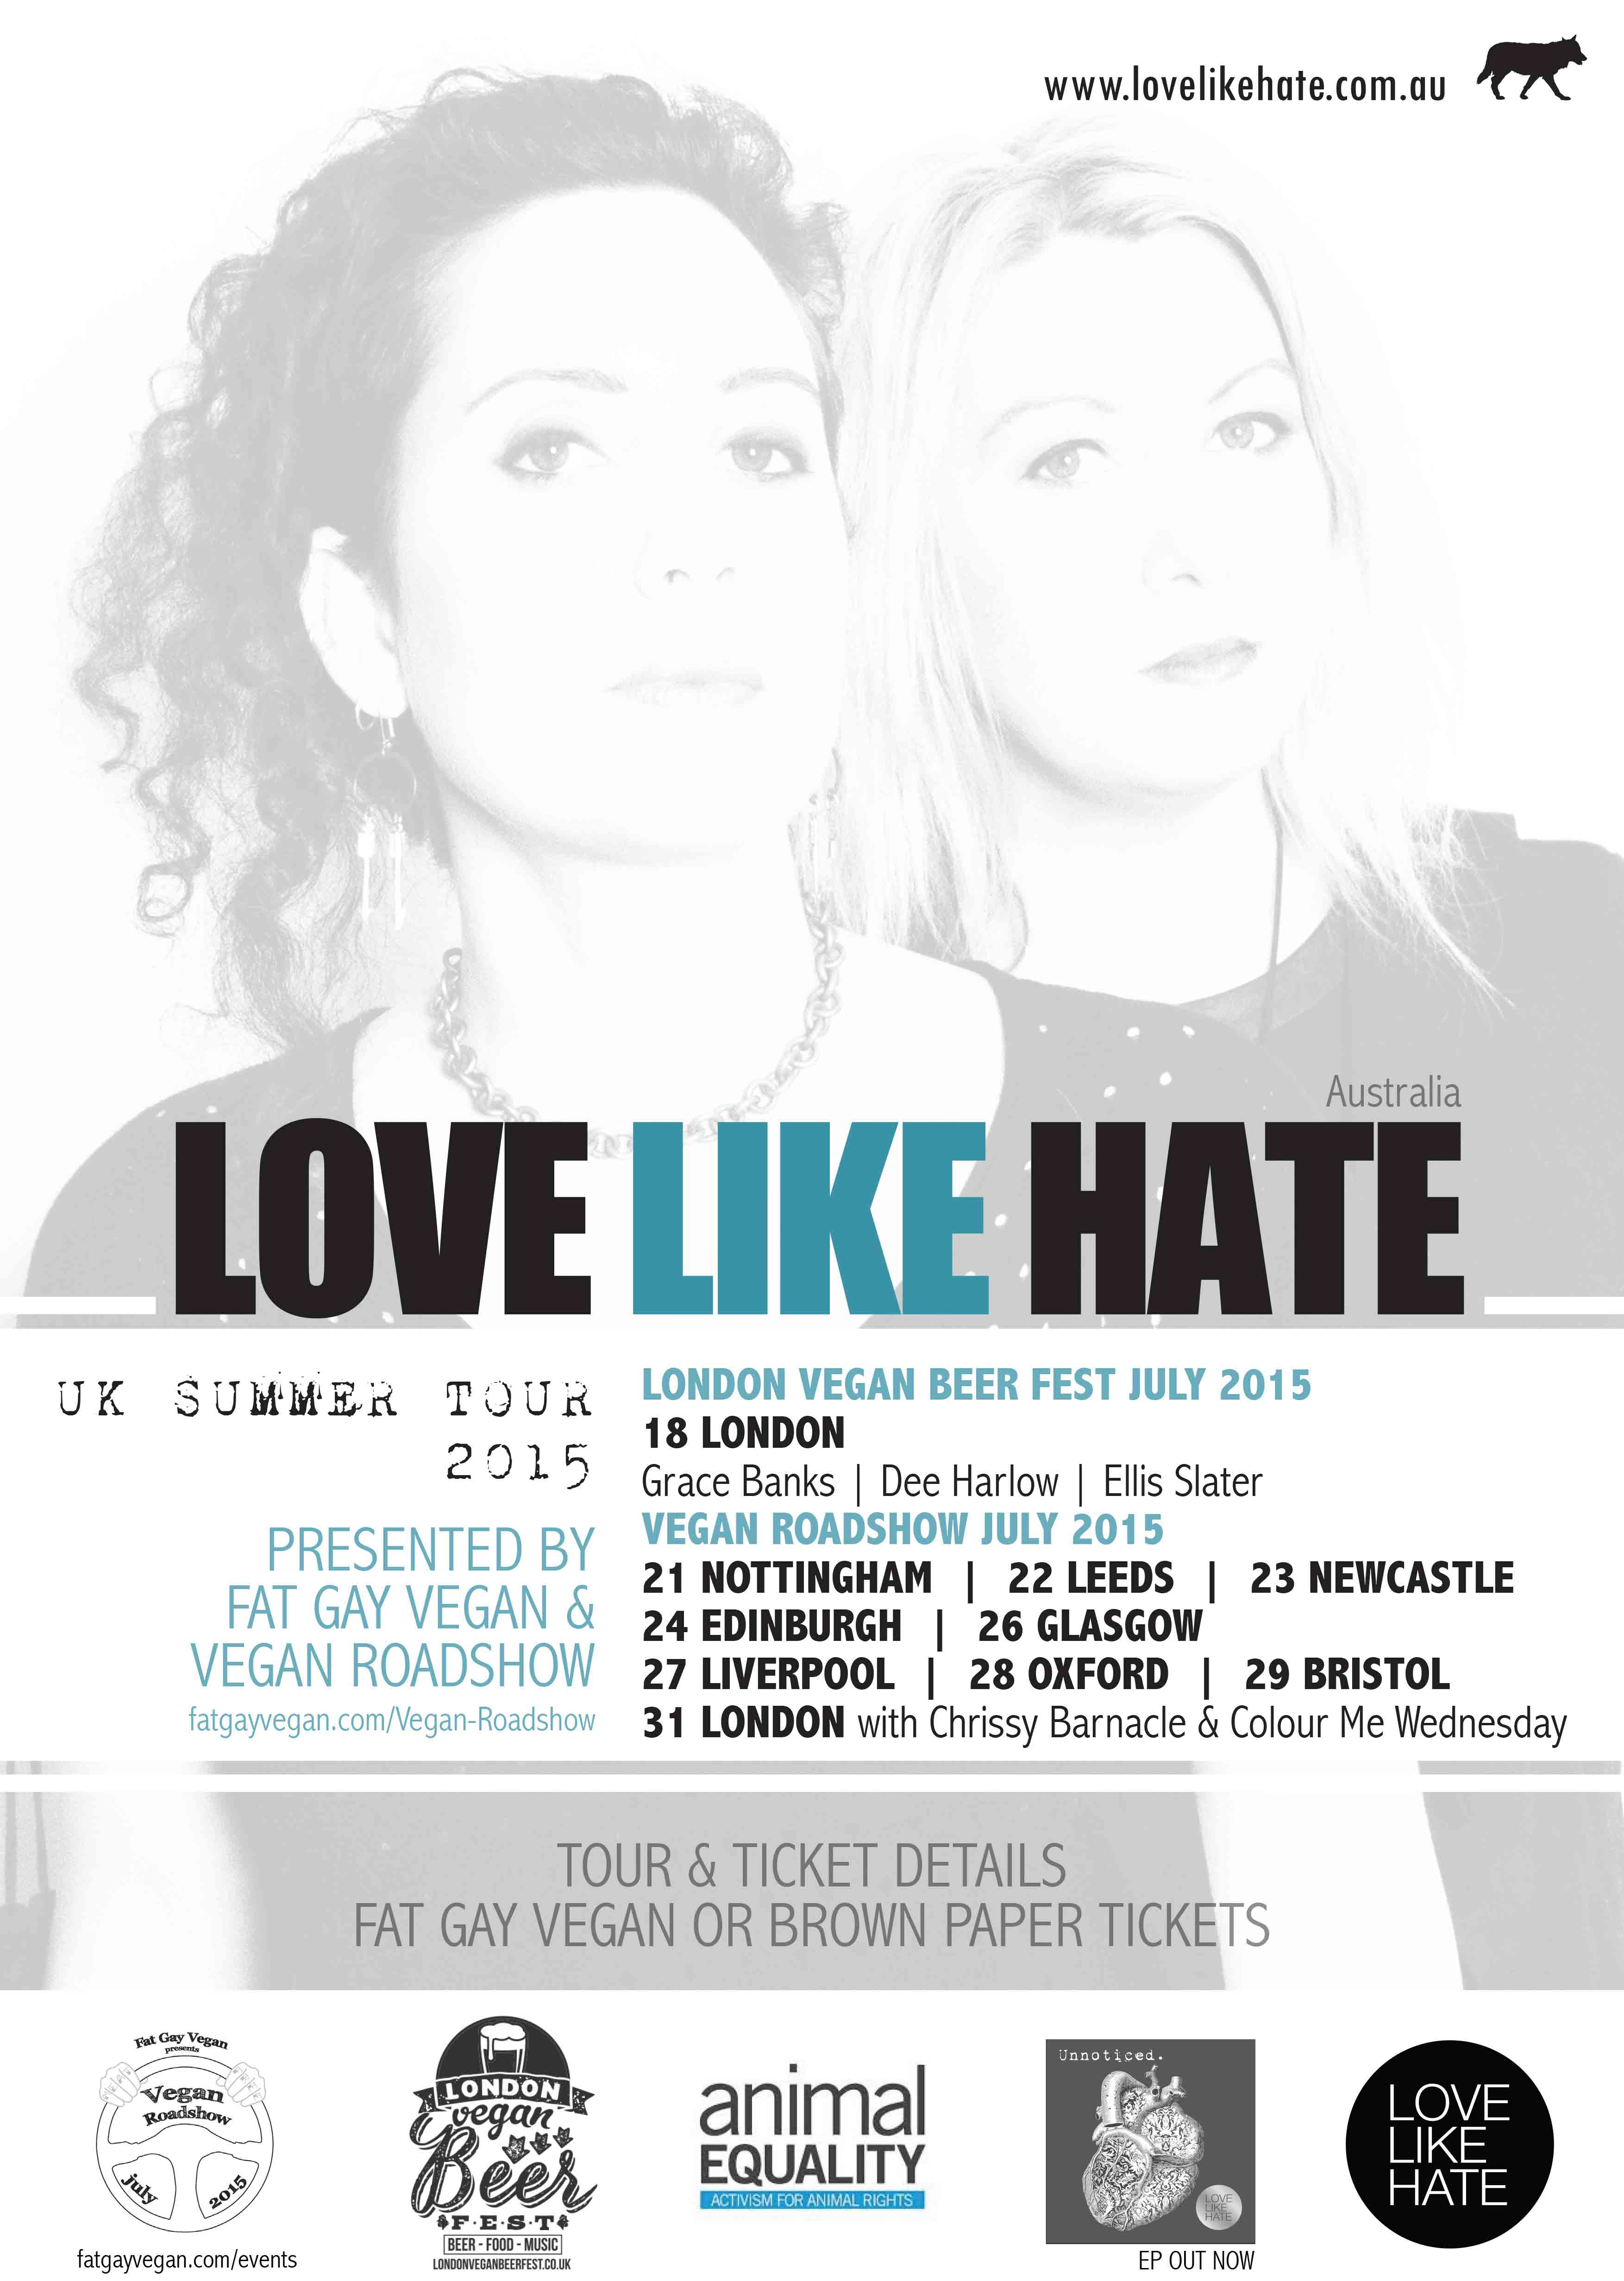 http://i1.wp.com/fatgayvegan.com/wp-content/uploads/2015/04/LoveLikeHate-2015-Tour-UK-21.jpg?fit=3507%2C4925